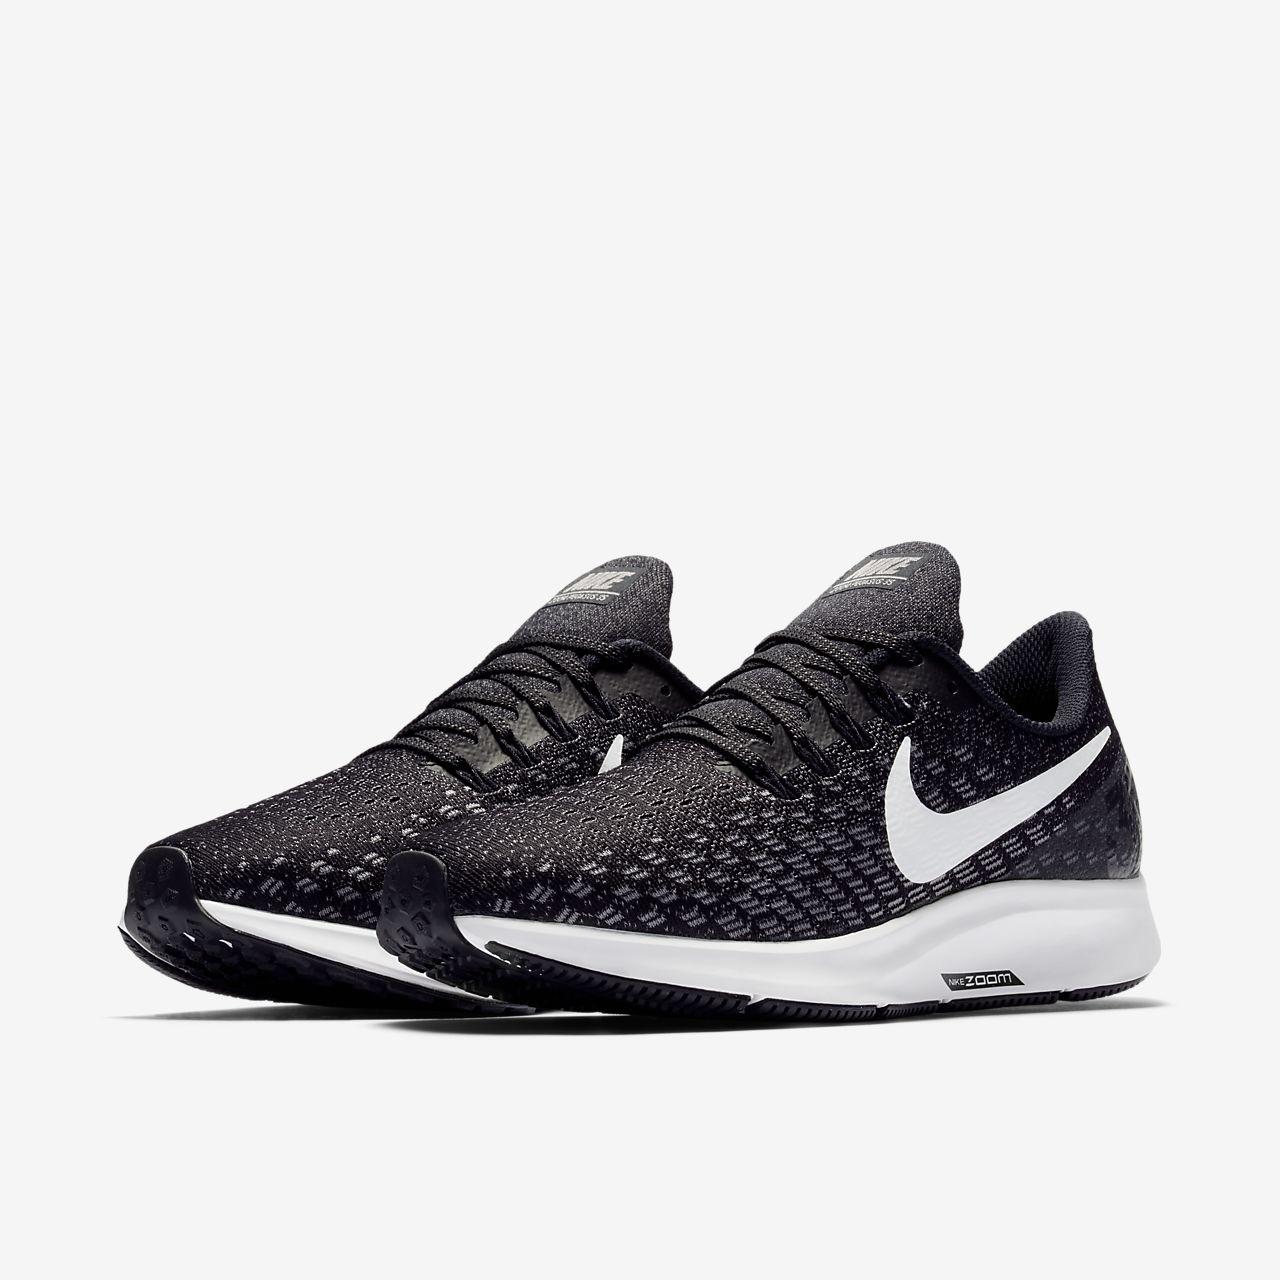 78ca3488ca17 Nike Air Zoom Pegasus 35 Women s Running Shoe (Wide). Nike.com GB